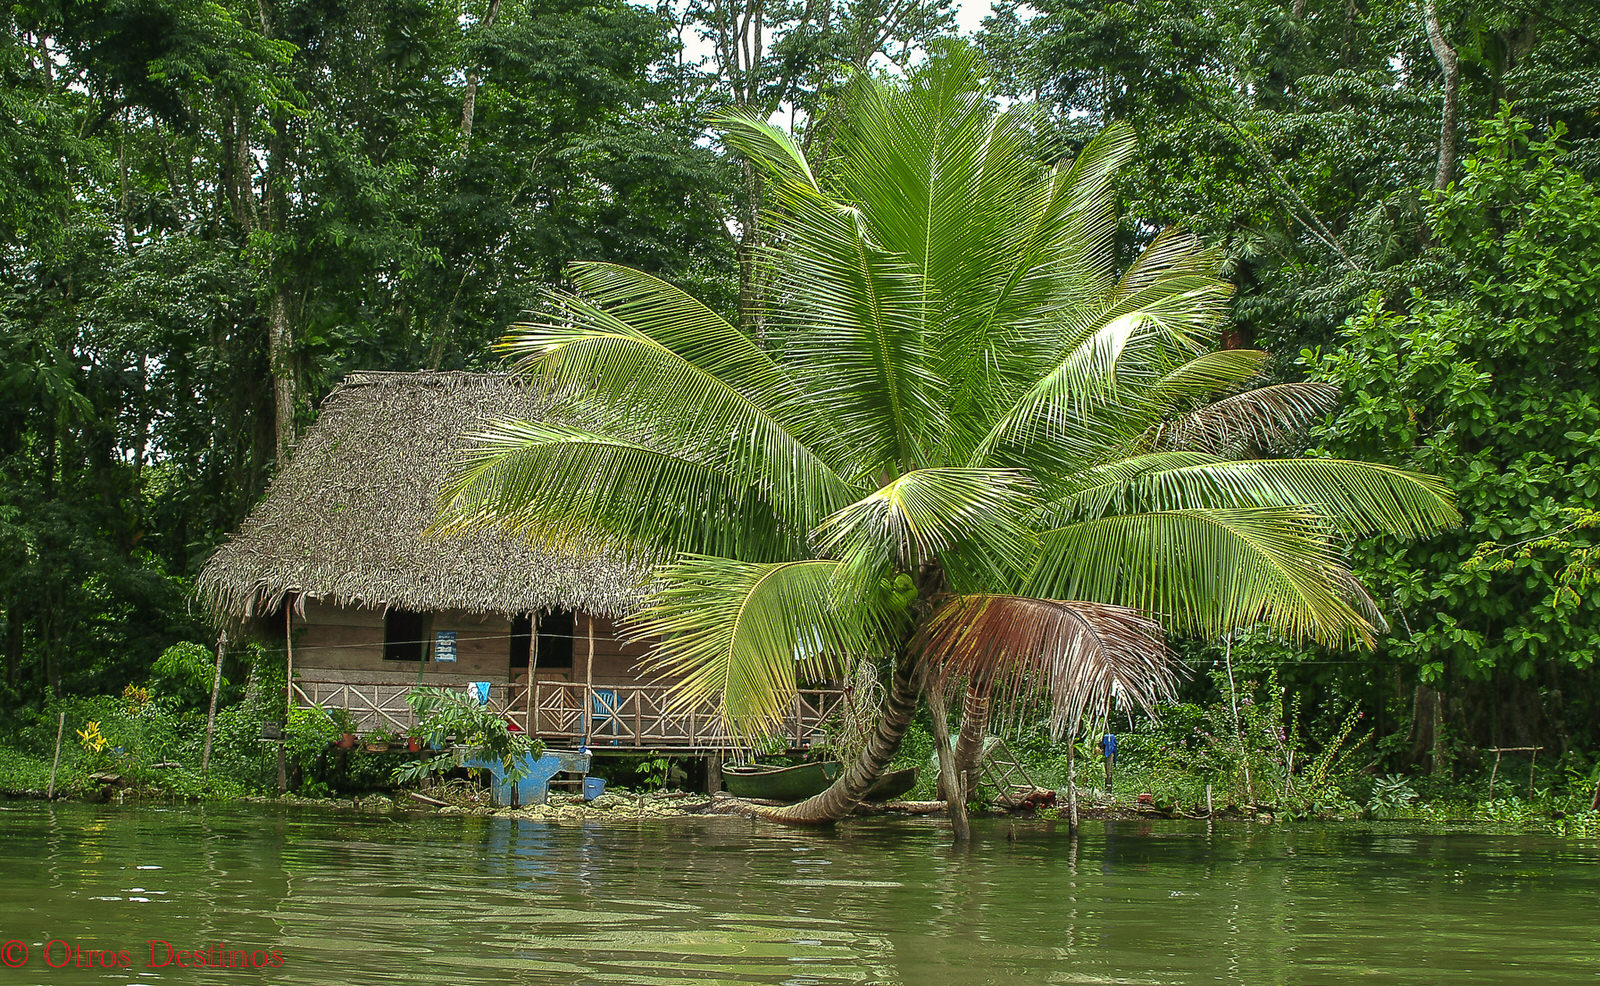 Rio dulce, Livingston y Tikal